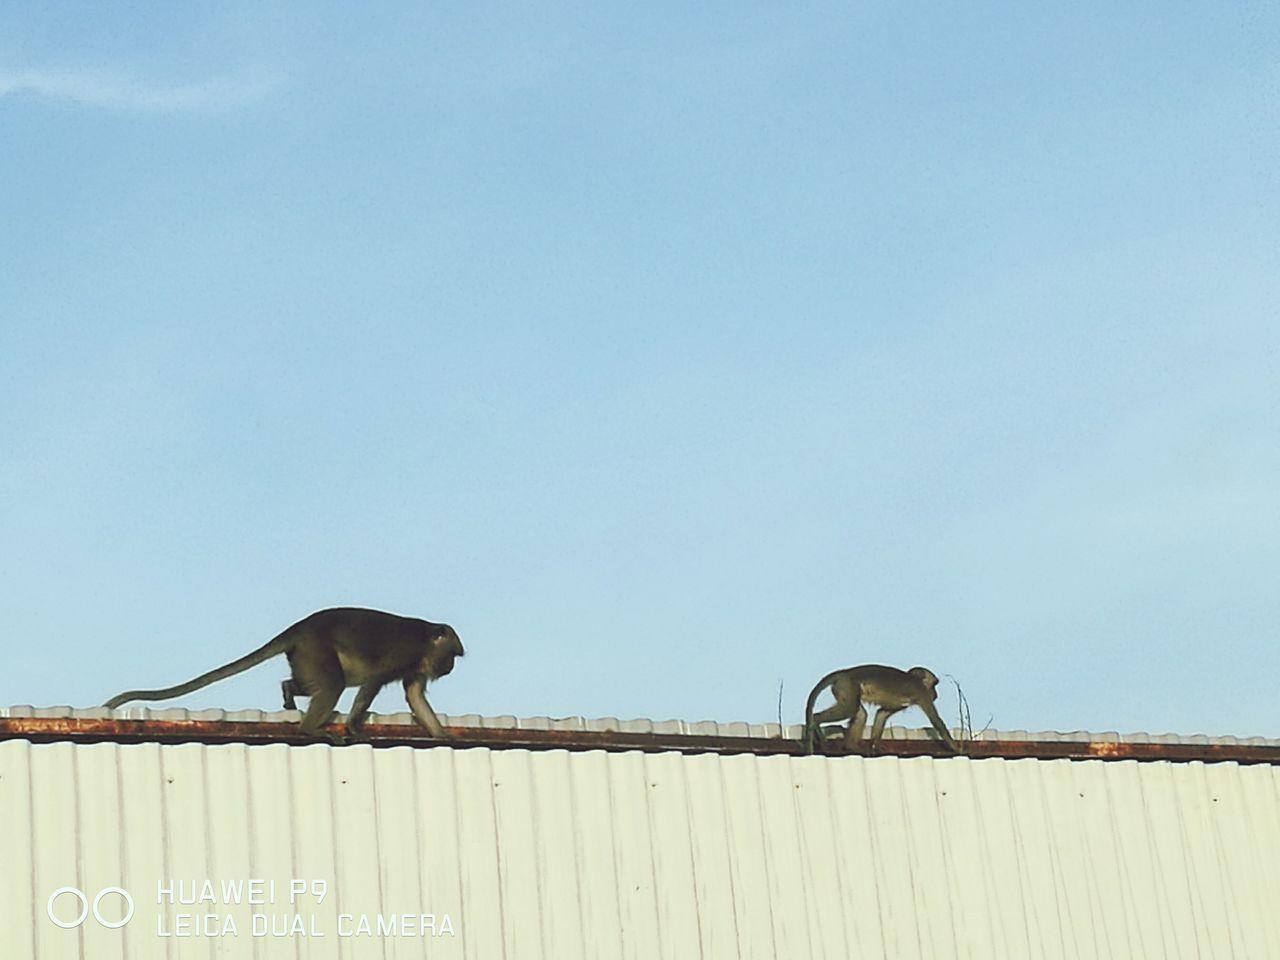 Huawei HuaweiP9 Monkey Animals Family Relaxing